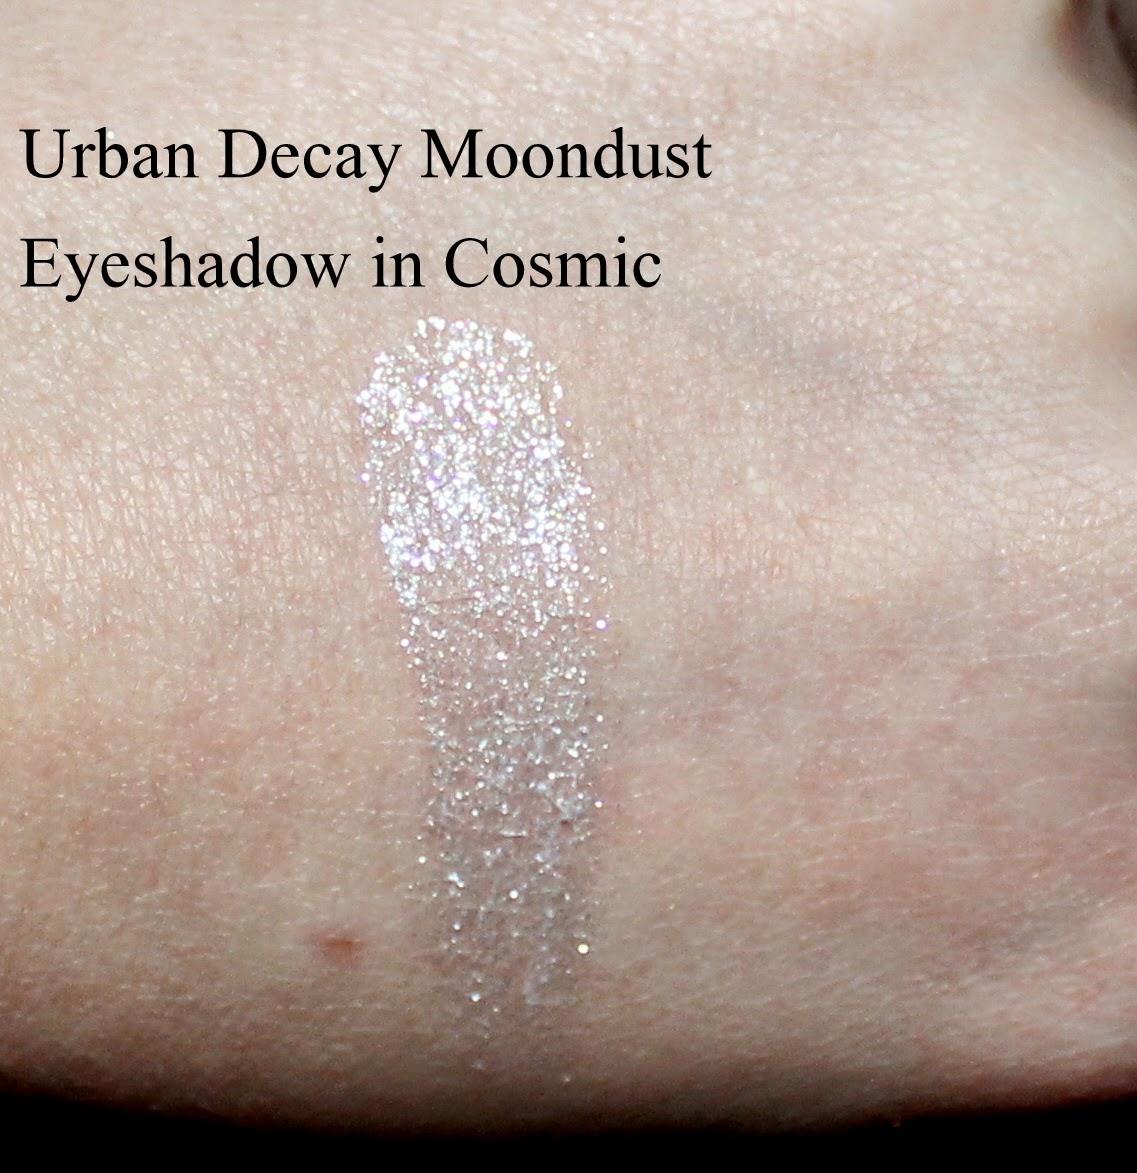 Urban Decay Moondust Eyeshadow in Cosmic